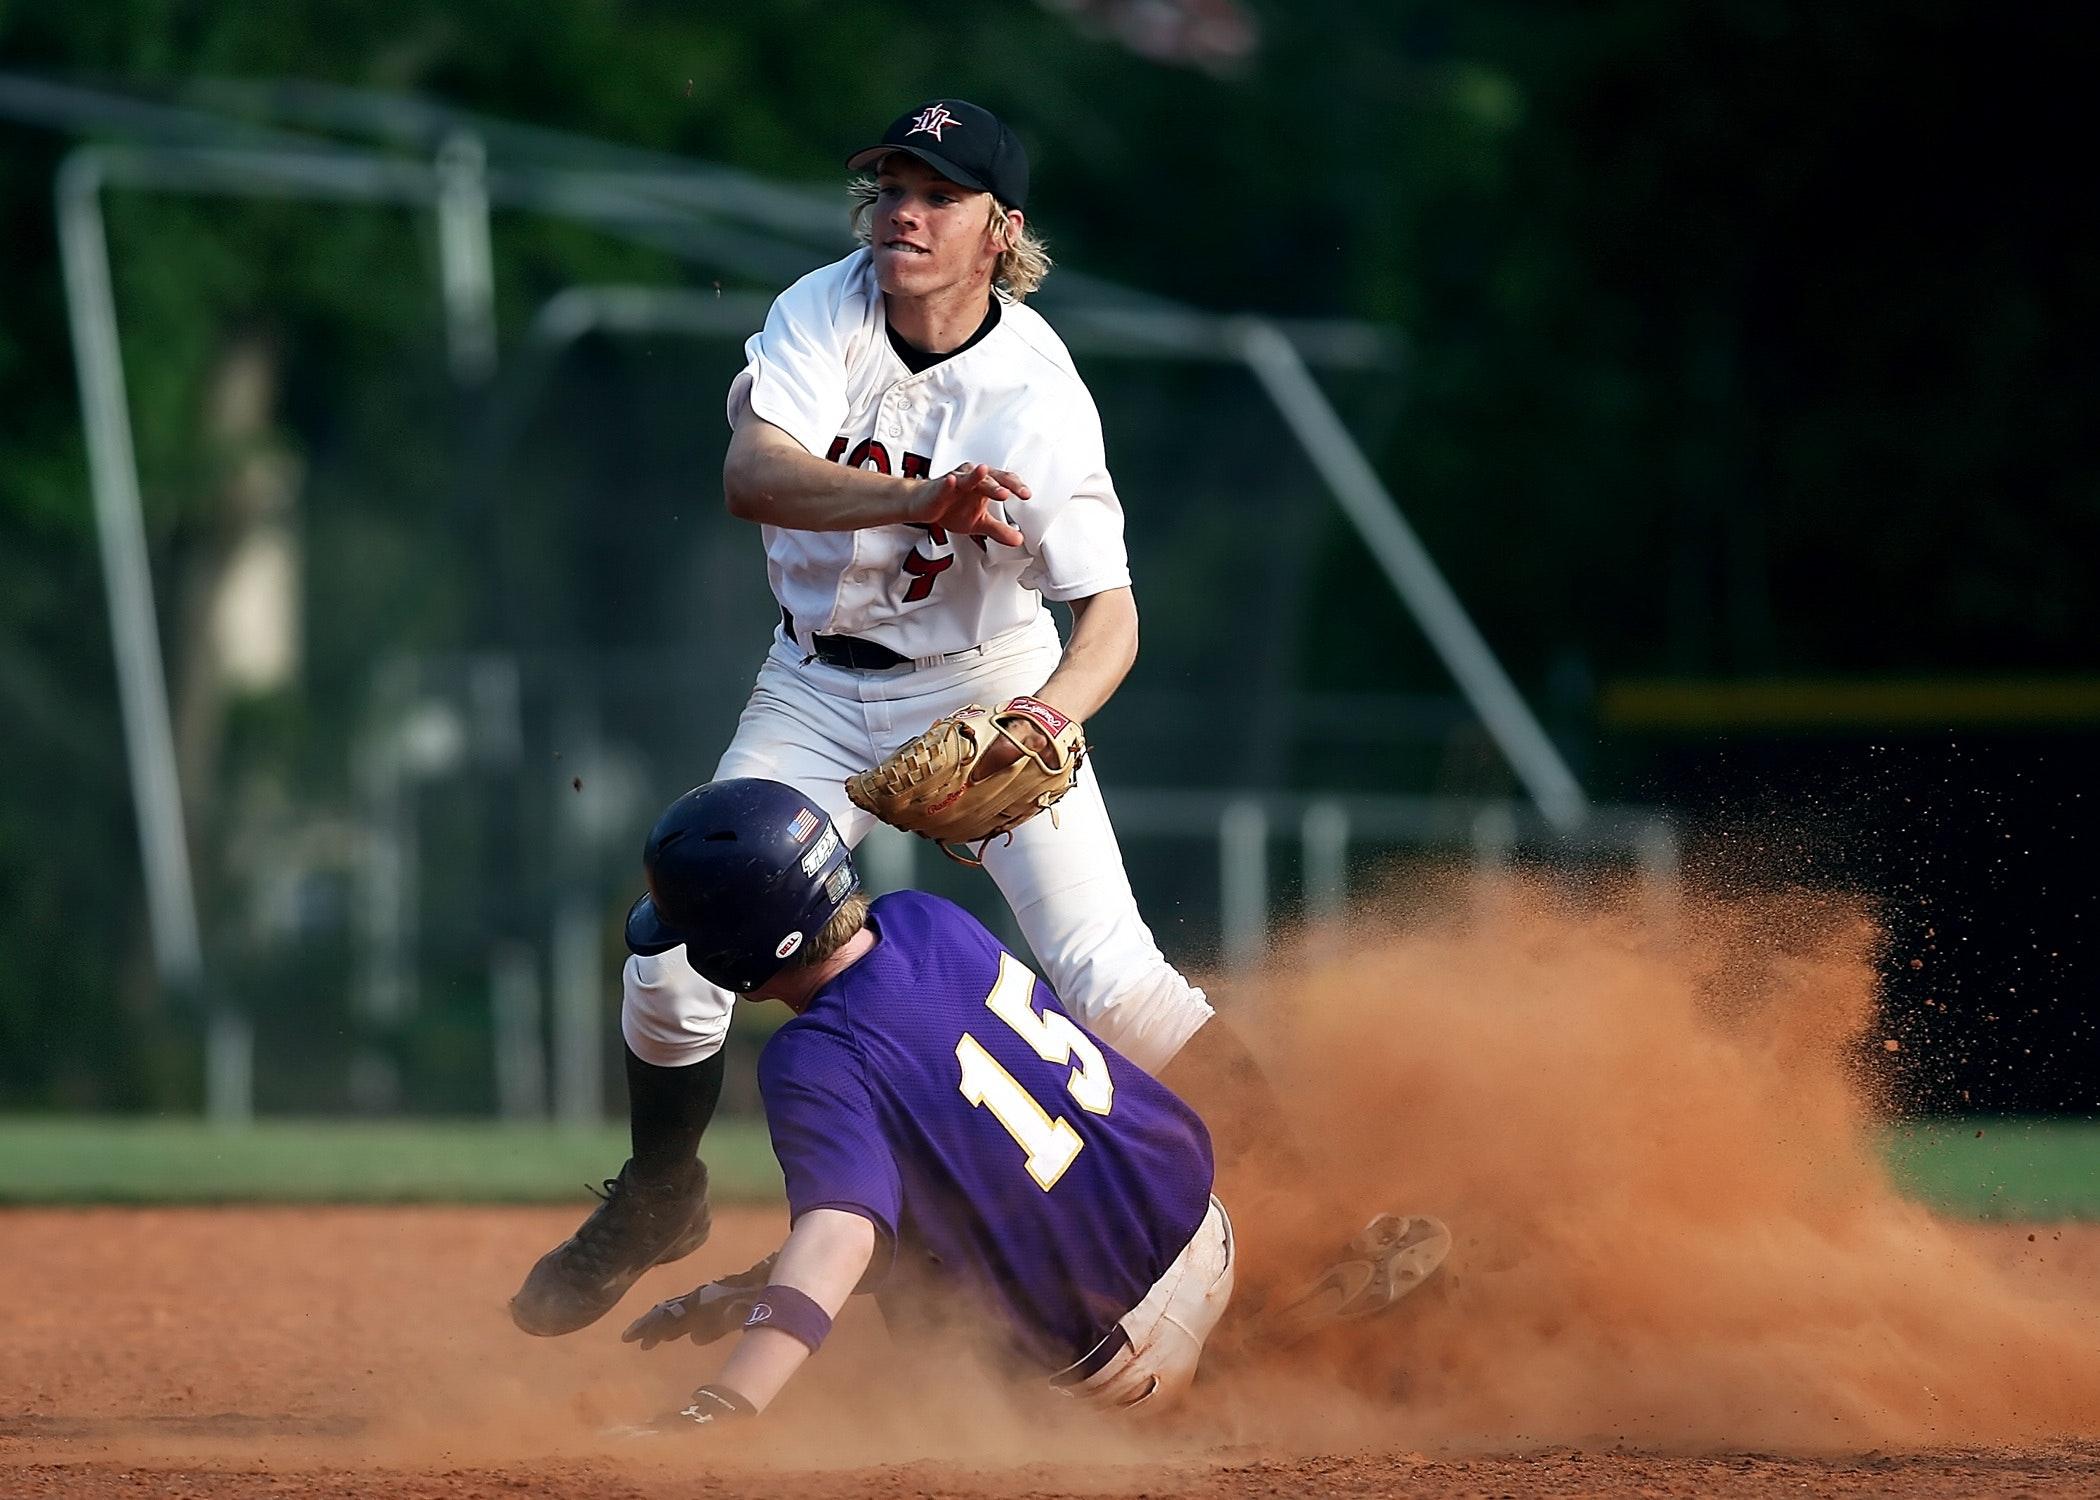 116 athletes-baseball-baseball-players-159567.jpg